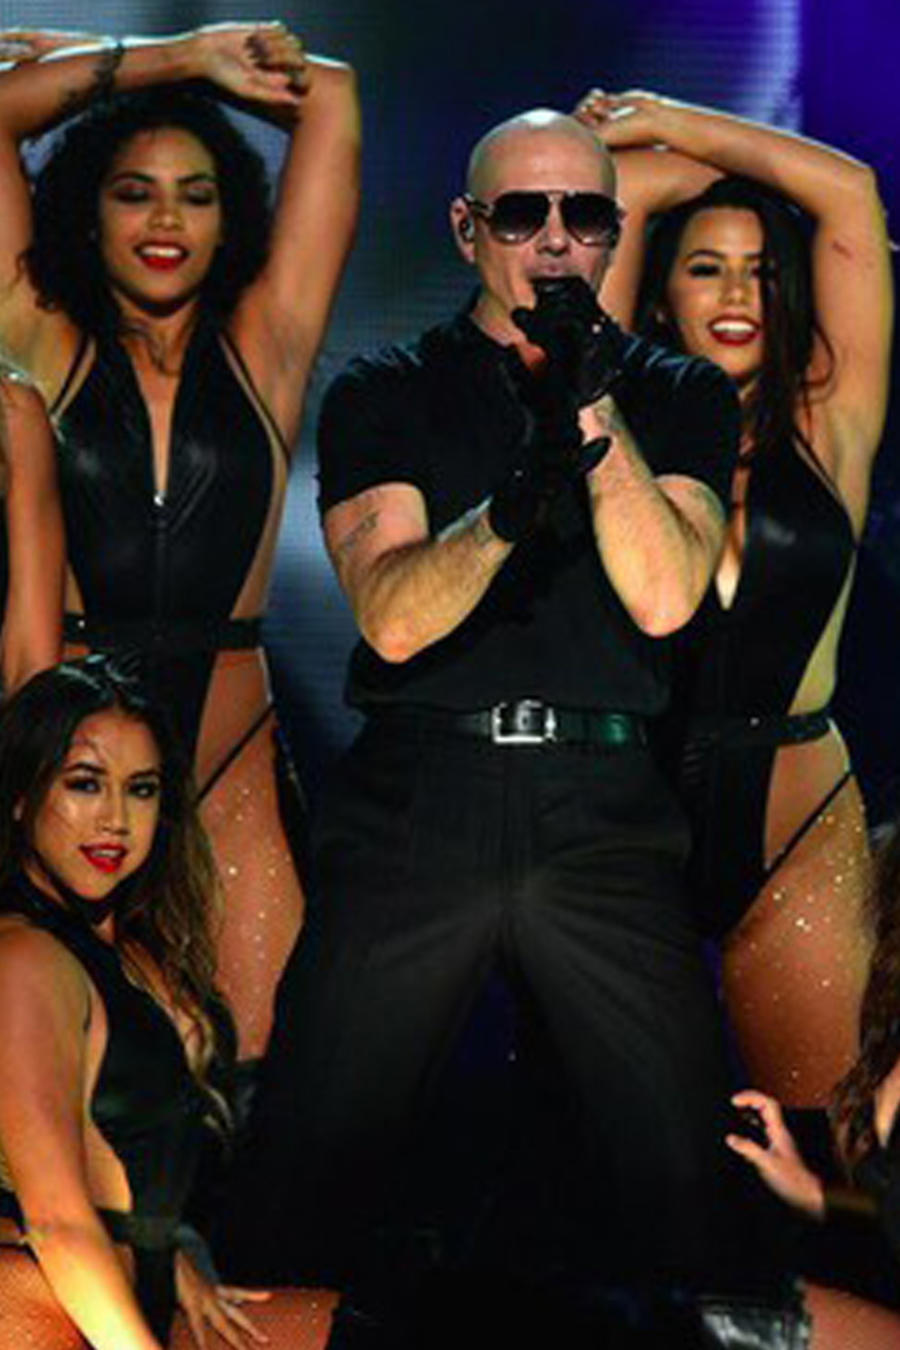 Pitbull y sus bailarinas